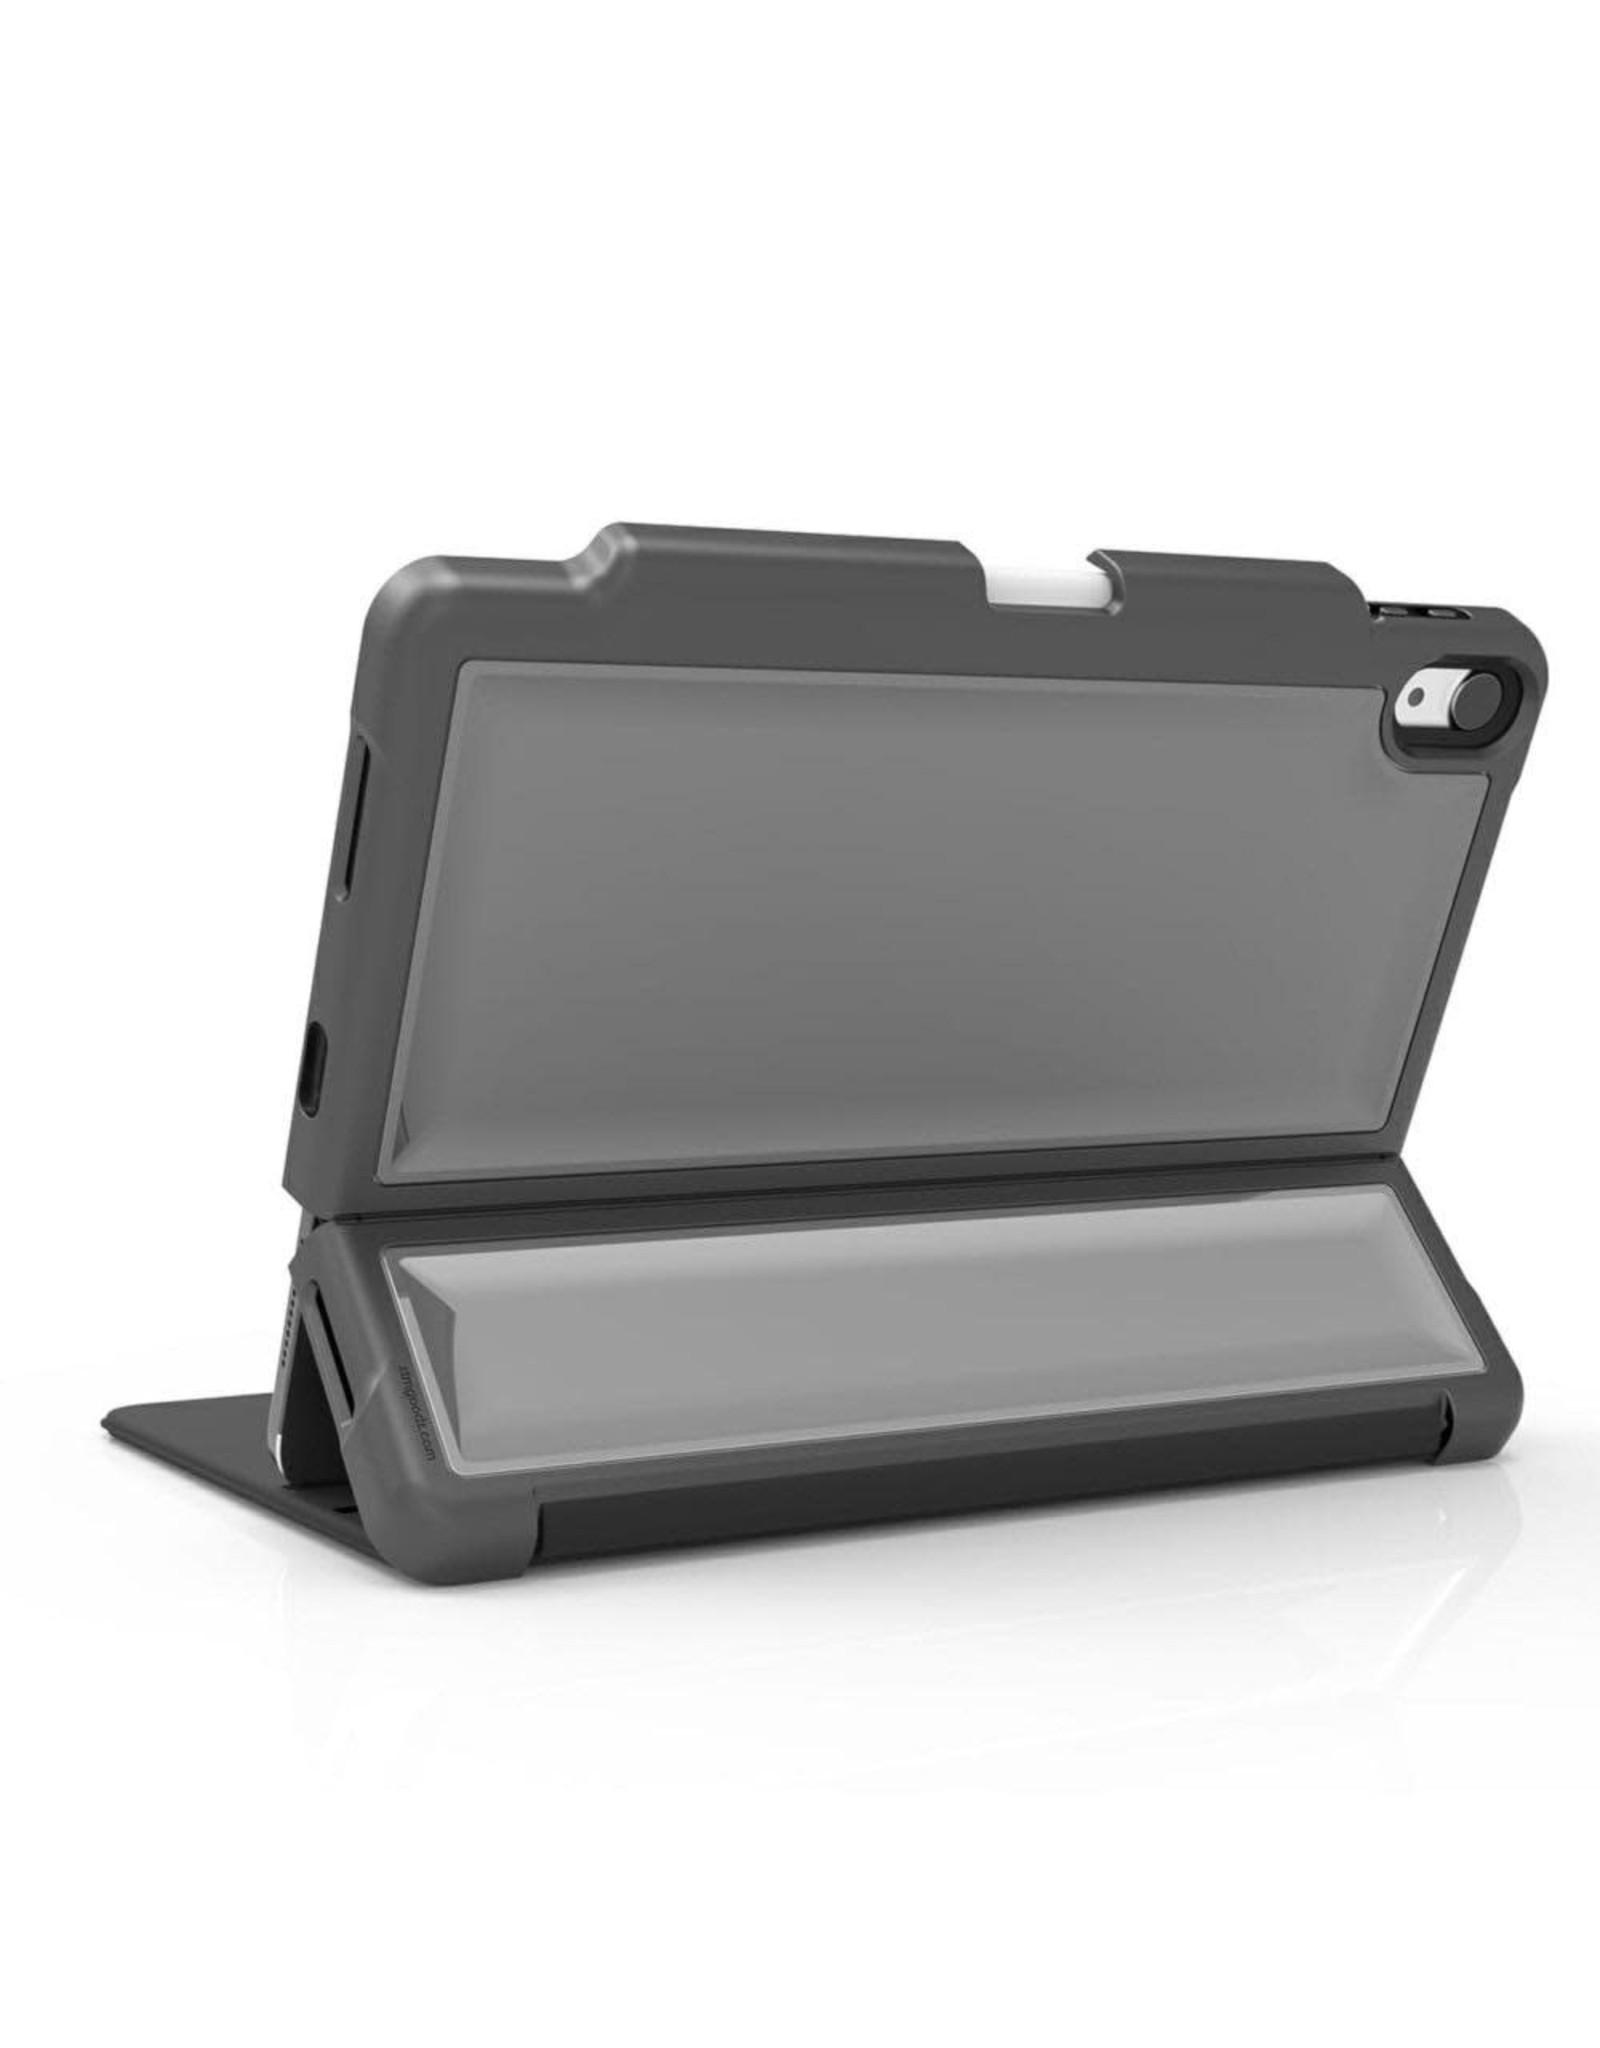 "STM STM Dux Shell for Folio iPad Pro 12.9"" (3rd gen) - Black"